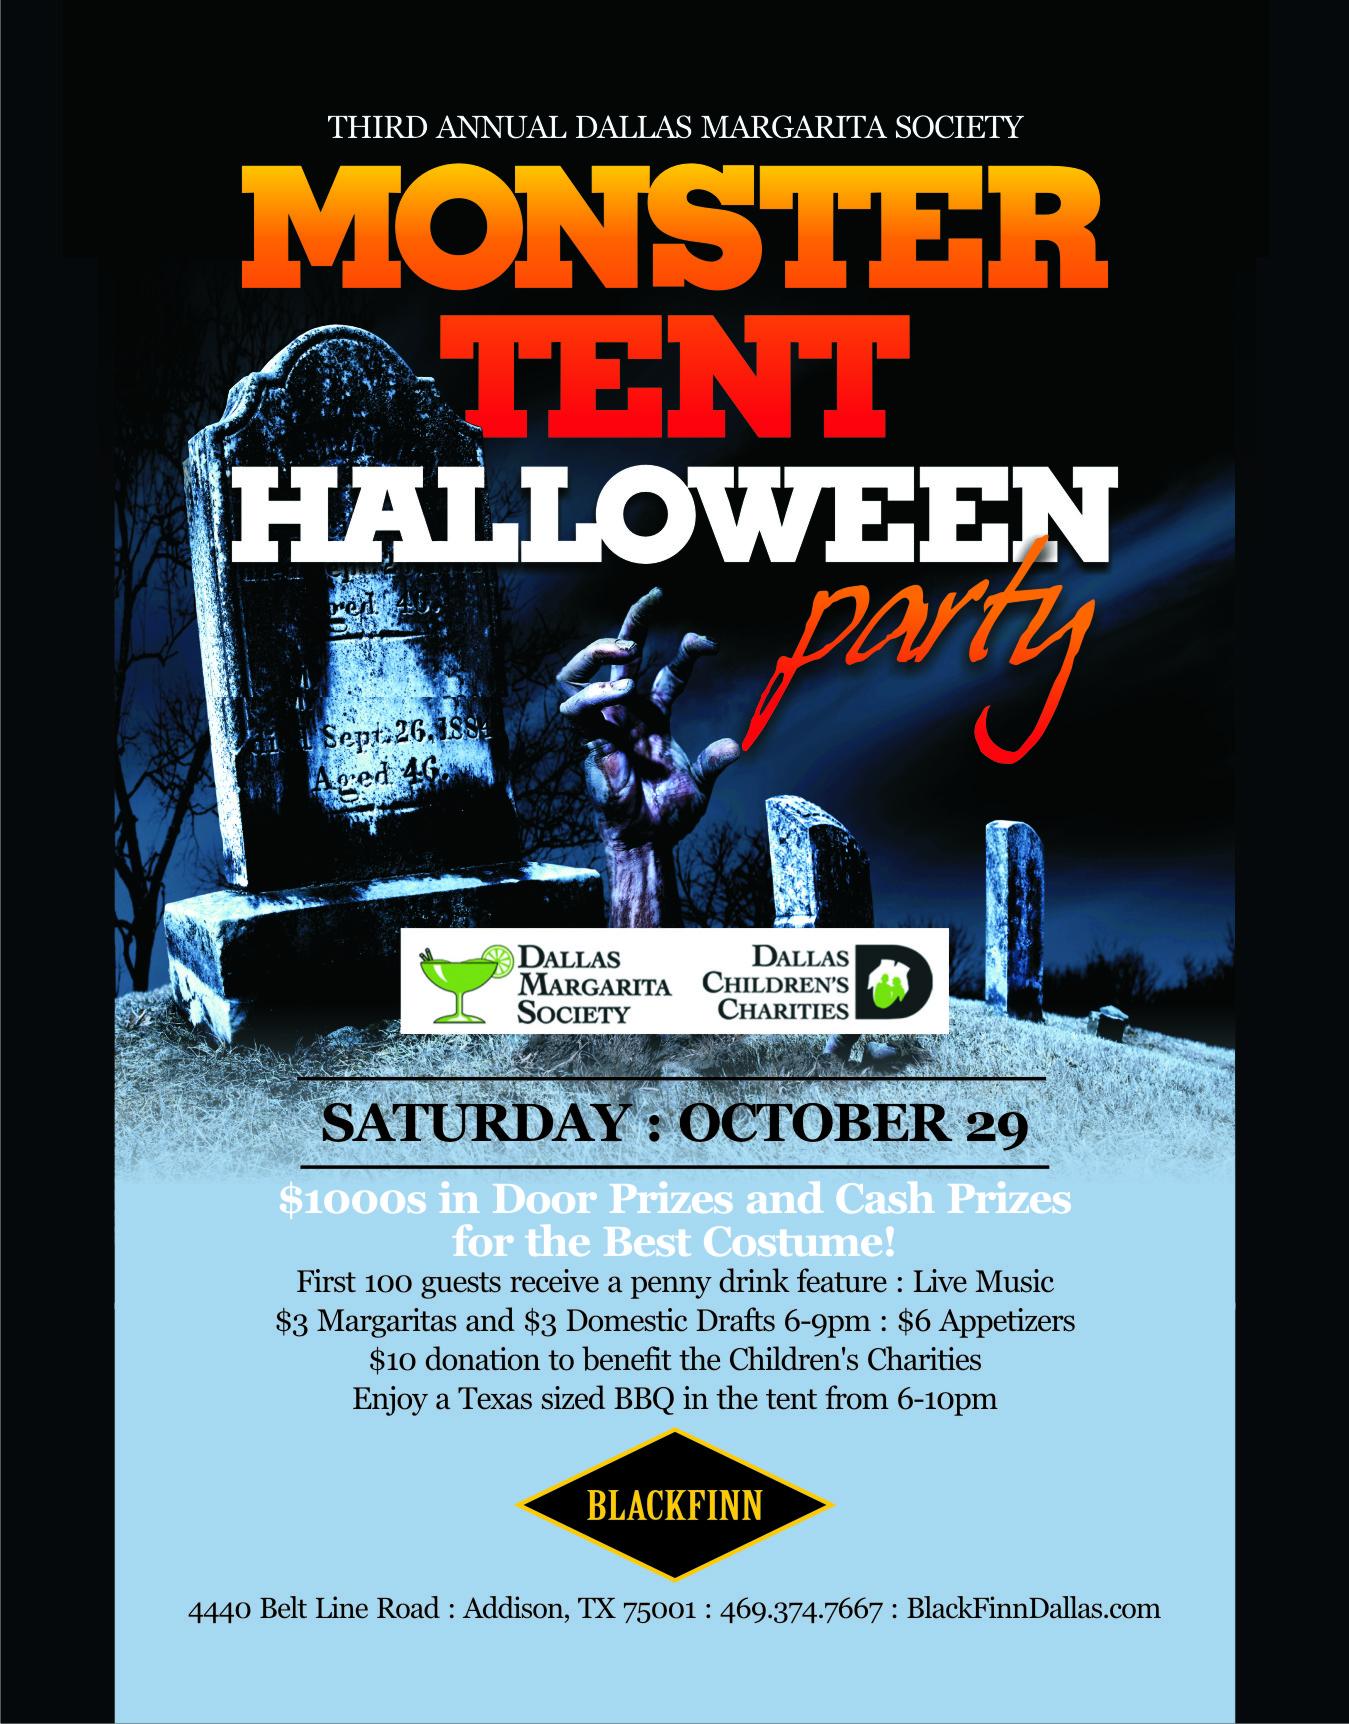 Dallas Margarita Society:: DMS Monster Tent Halloween Party 2011!